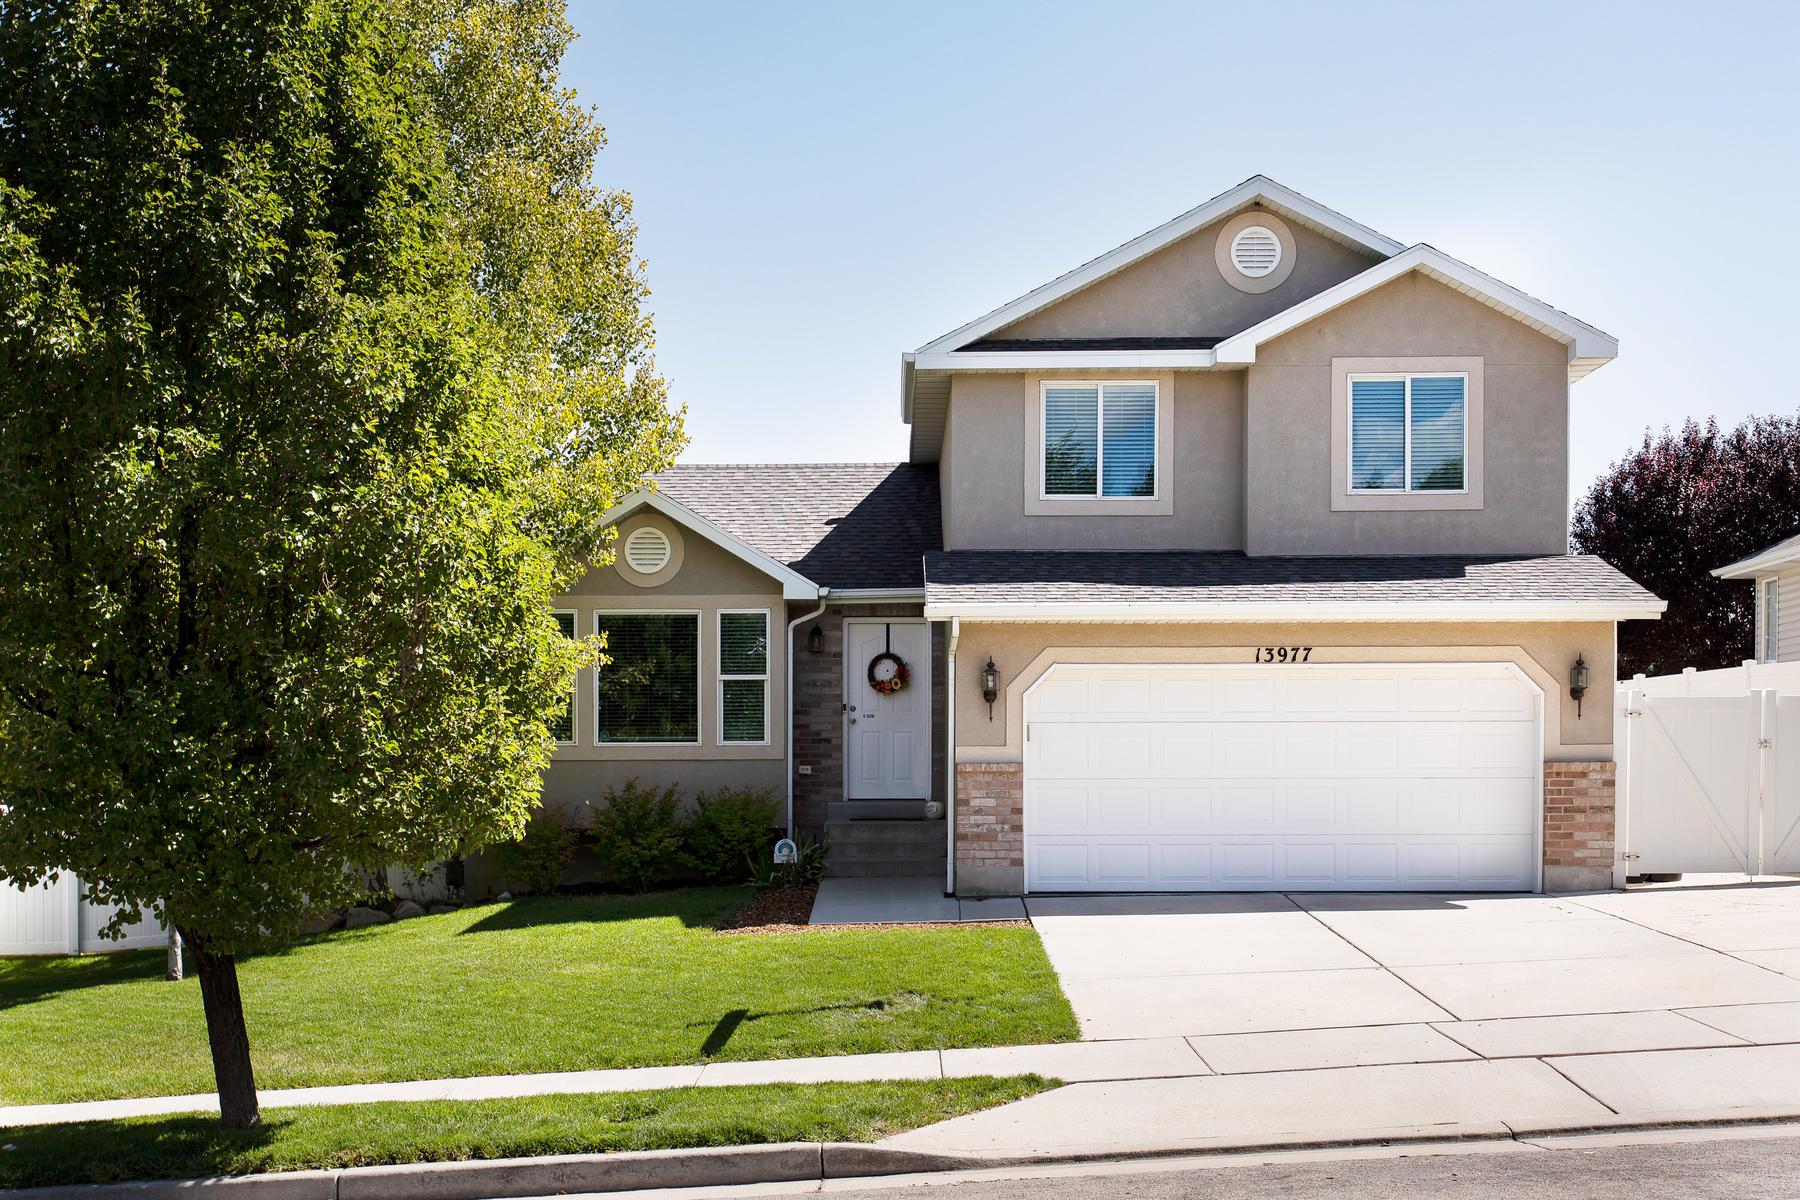 Single Family Homes for Sale at Radiant Rosecrest Residence 13977 S Friendship Drive, Herriman, Utah 84096 United States